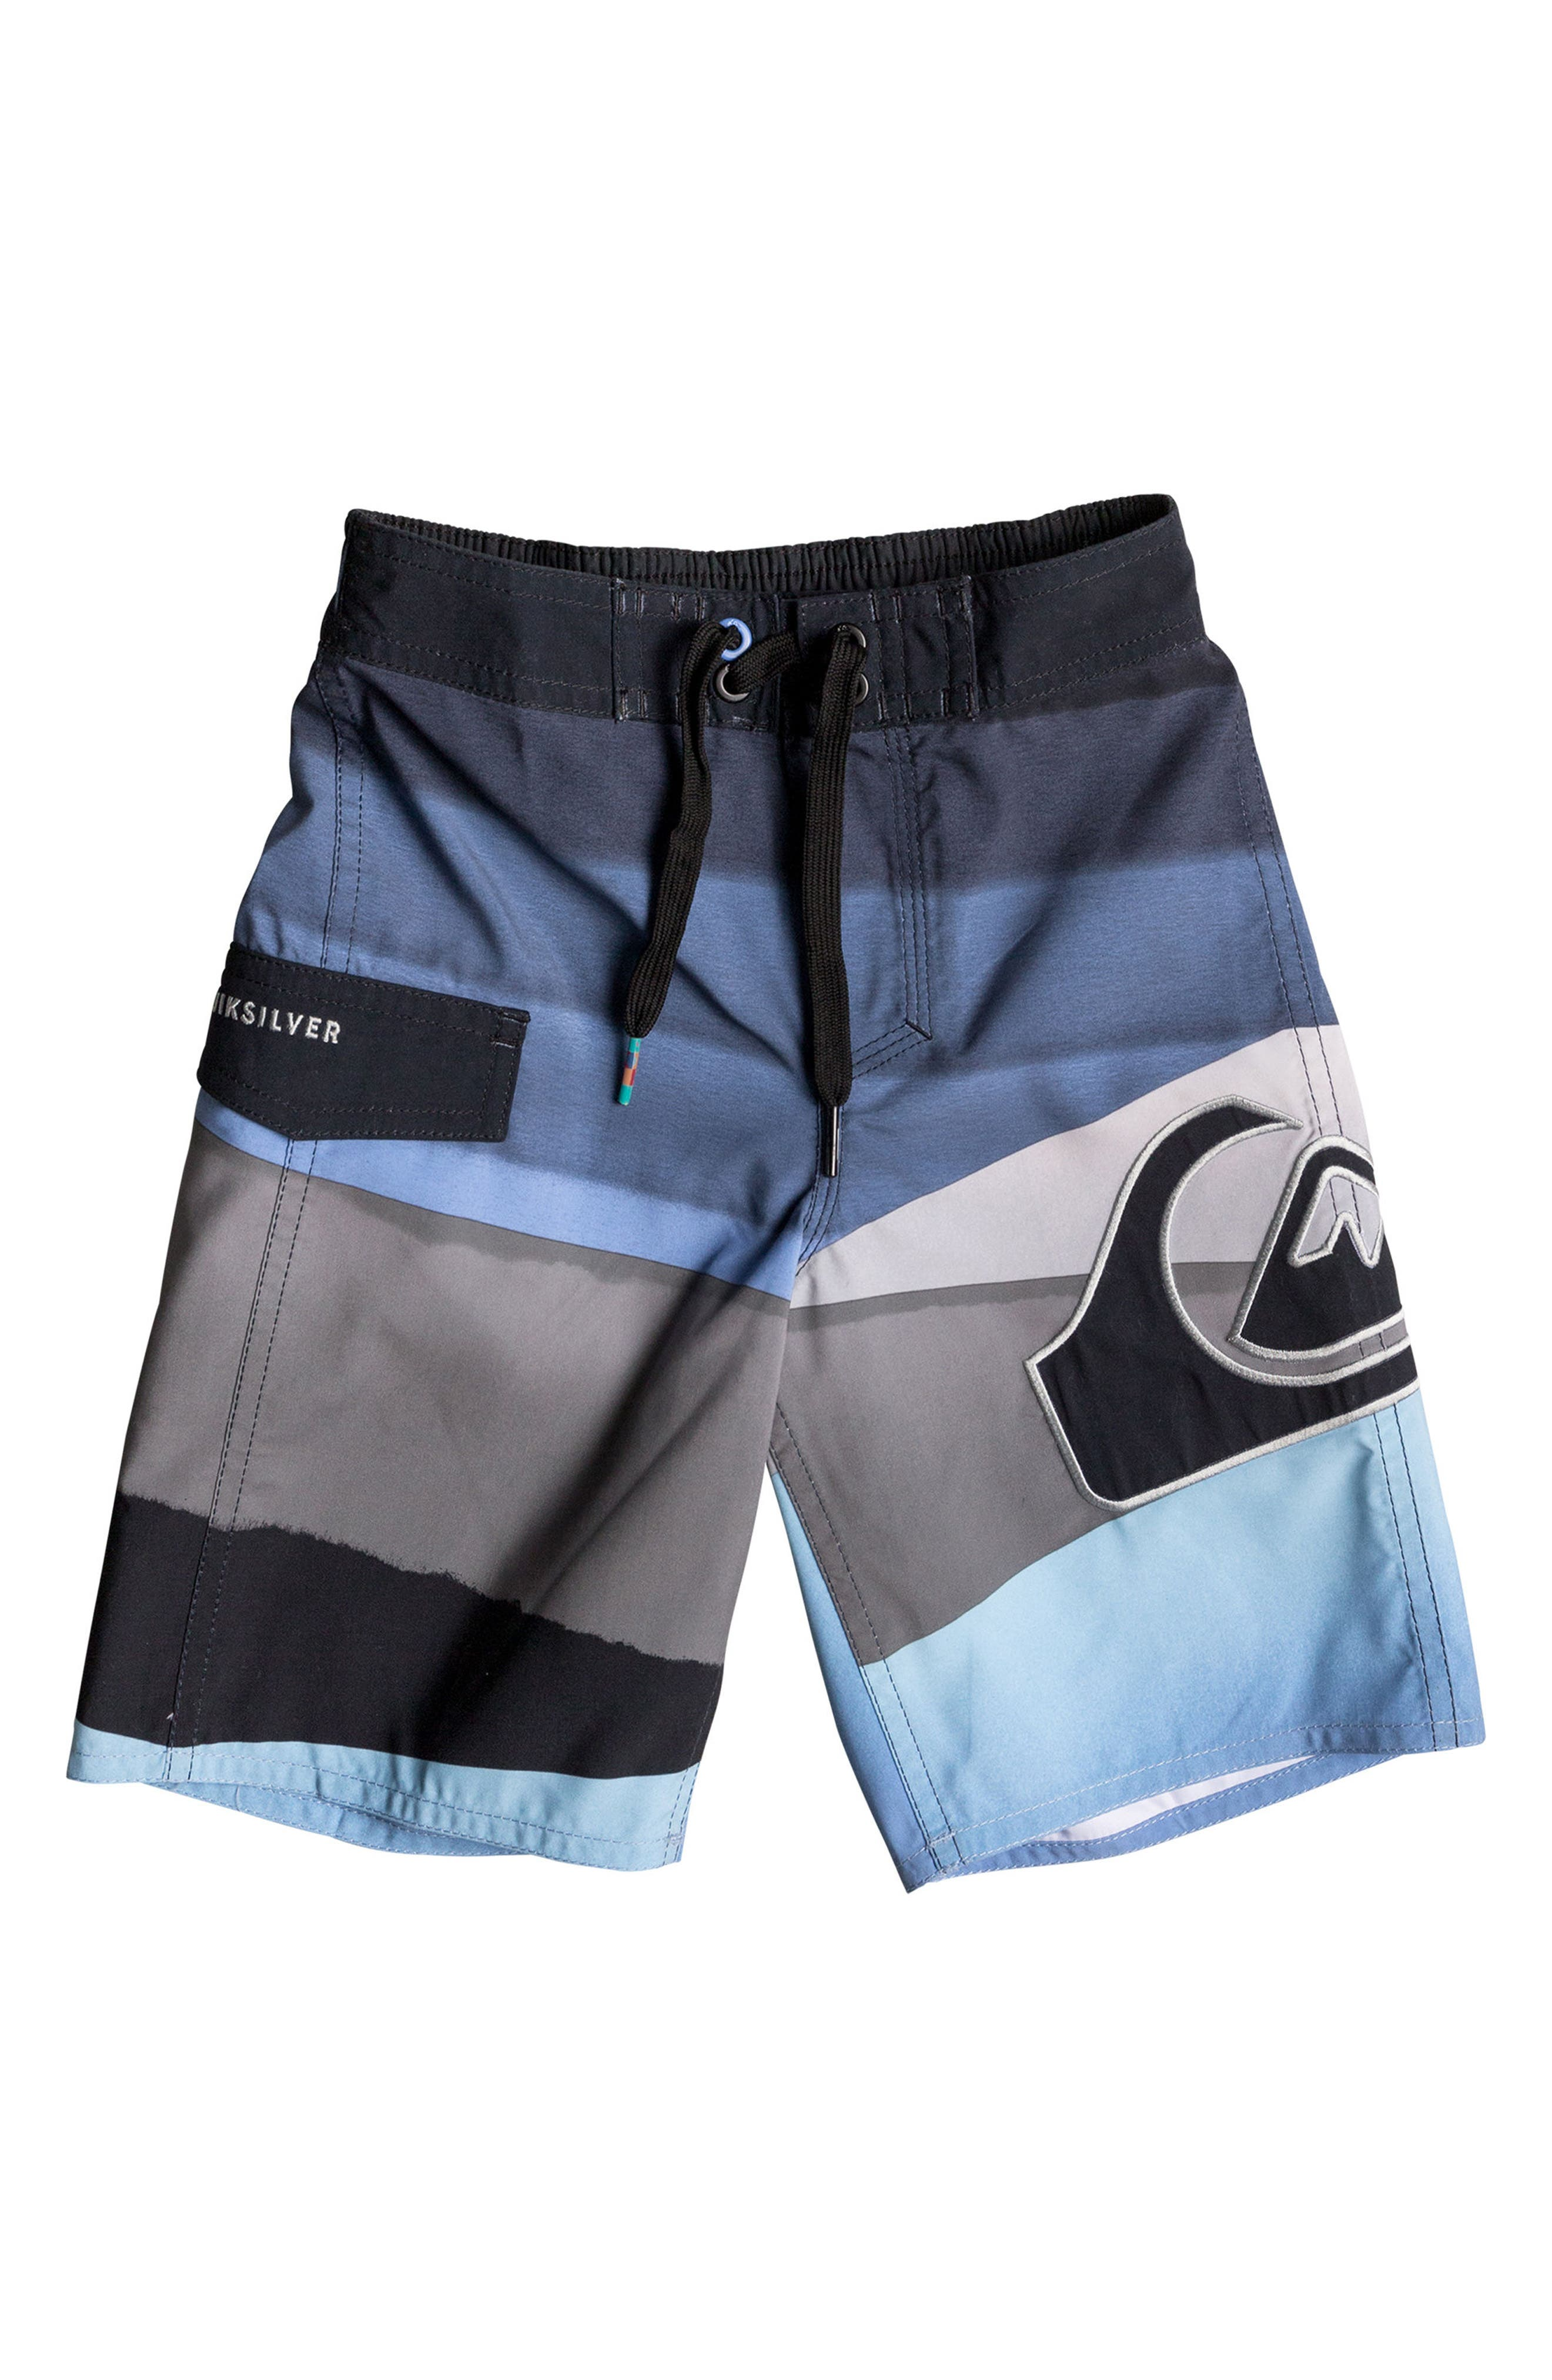 Slash Board Shorts,                         Main,                         color, Regatta